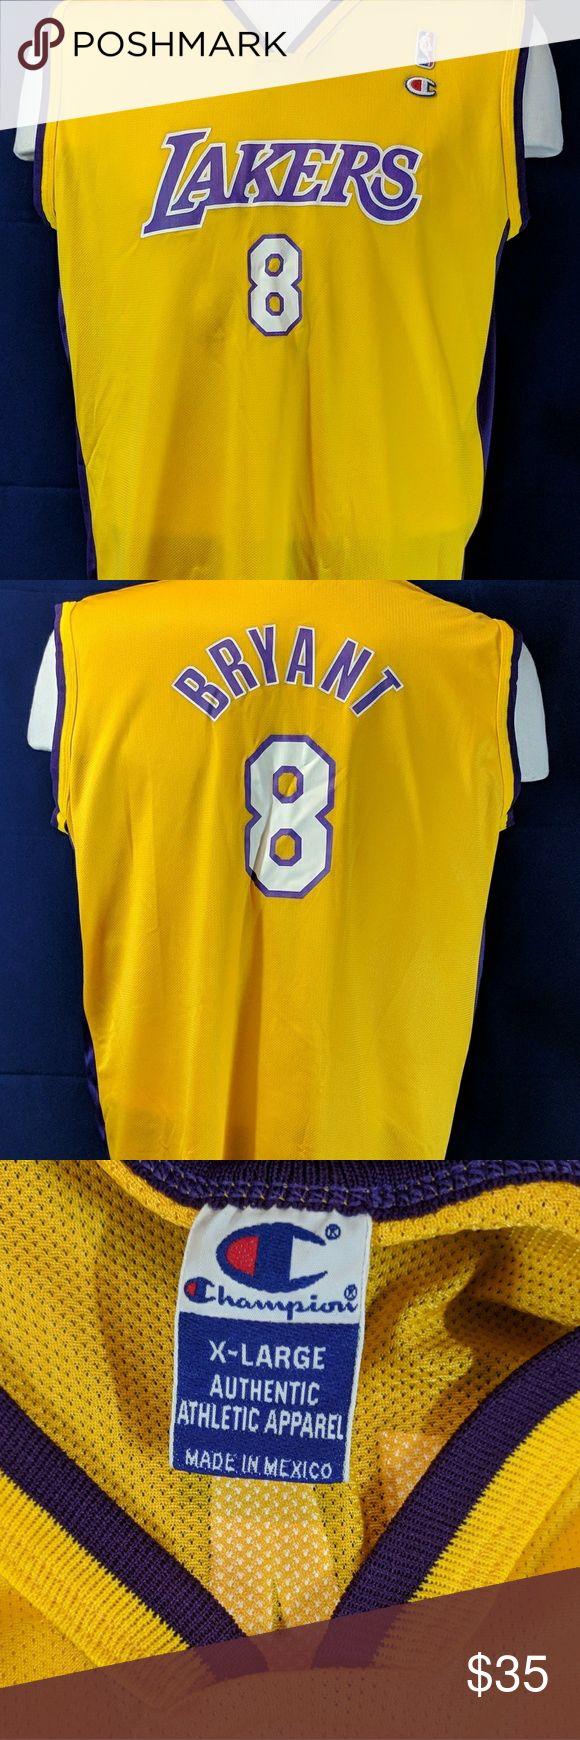 Champion NBA Lakers Kobe Bryant Jersey Condition: 8/10 Rare Champion Lakers Home Jersey Kobe Bryant Number 8 Size X-Large Champion Shirts Tees - Short Sleeve